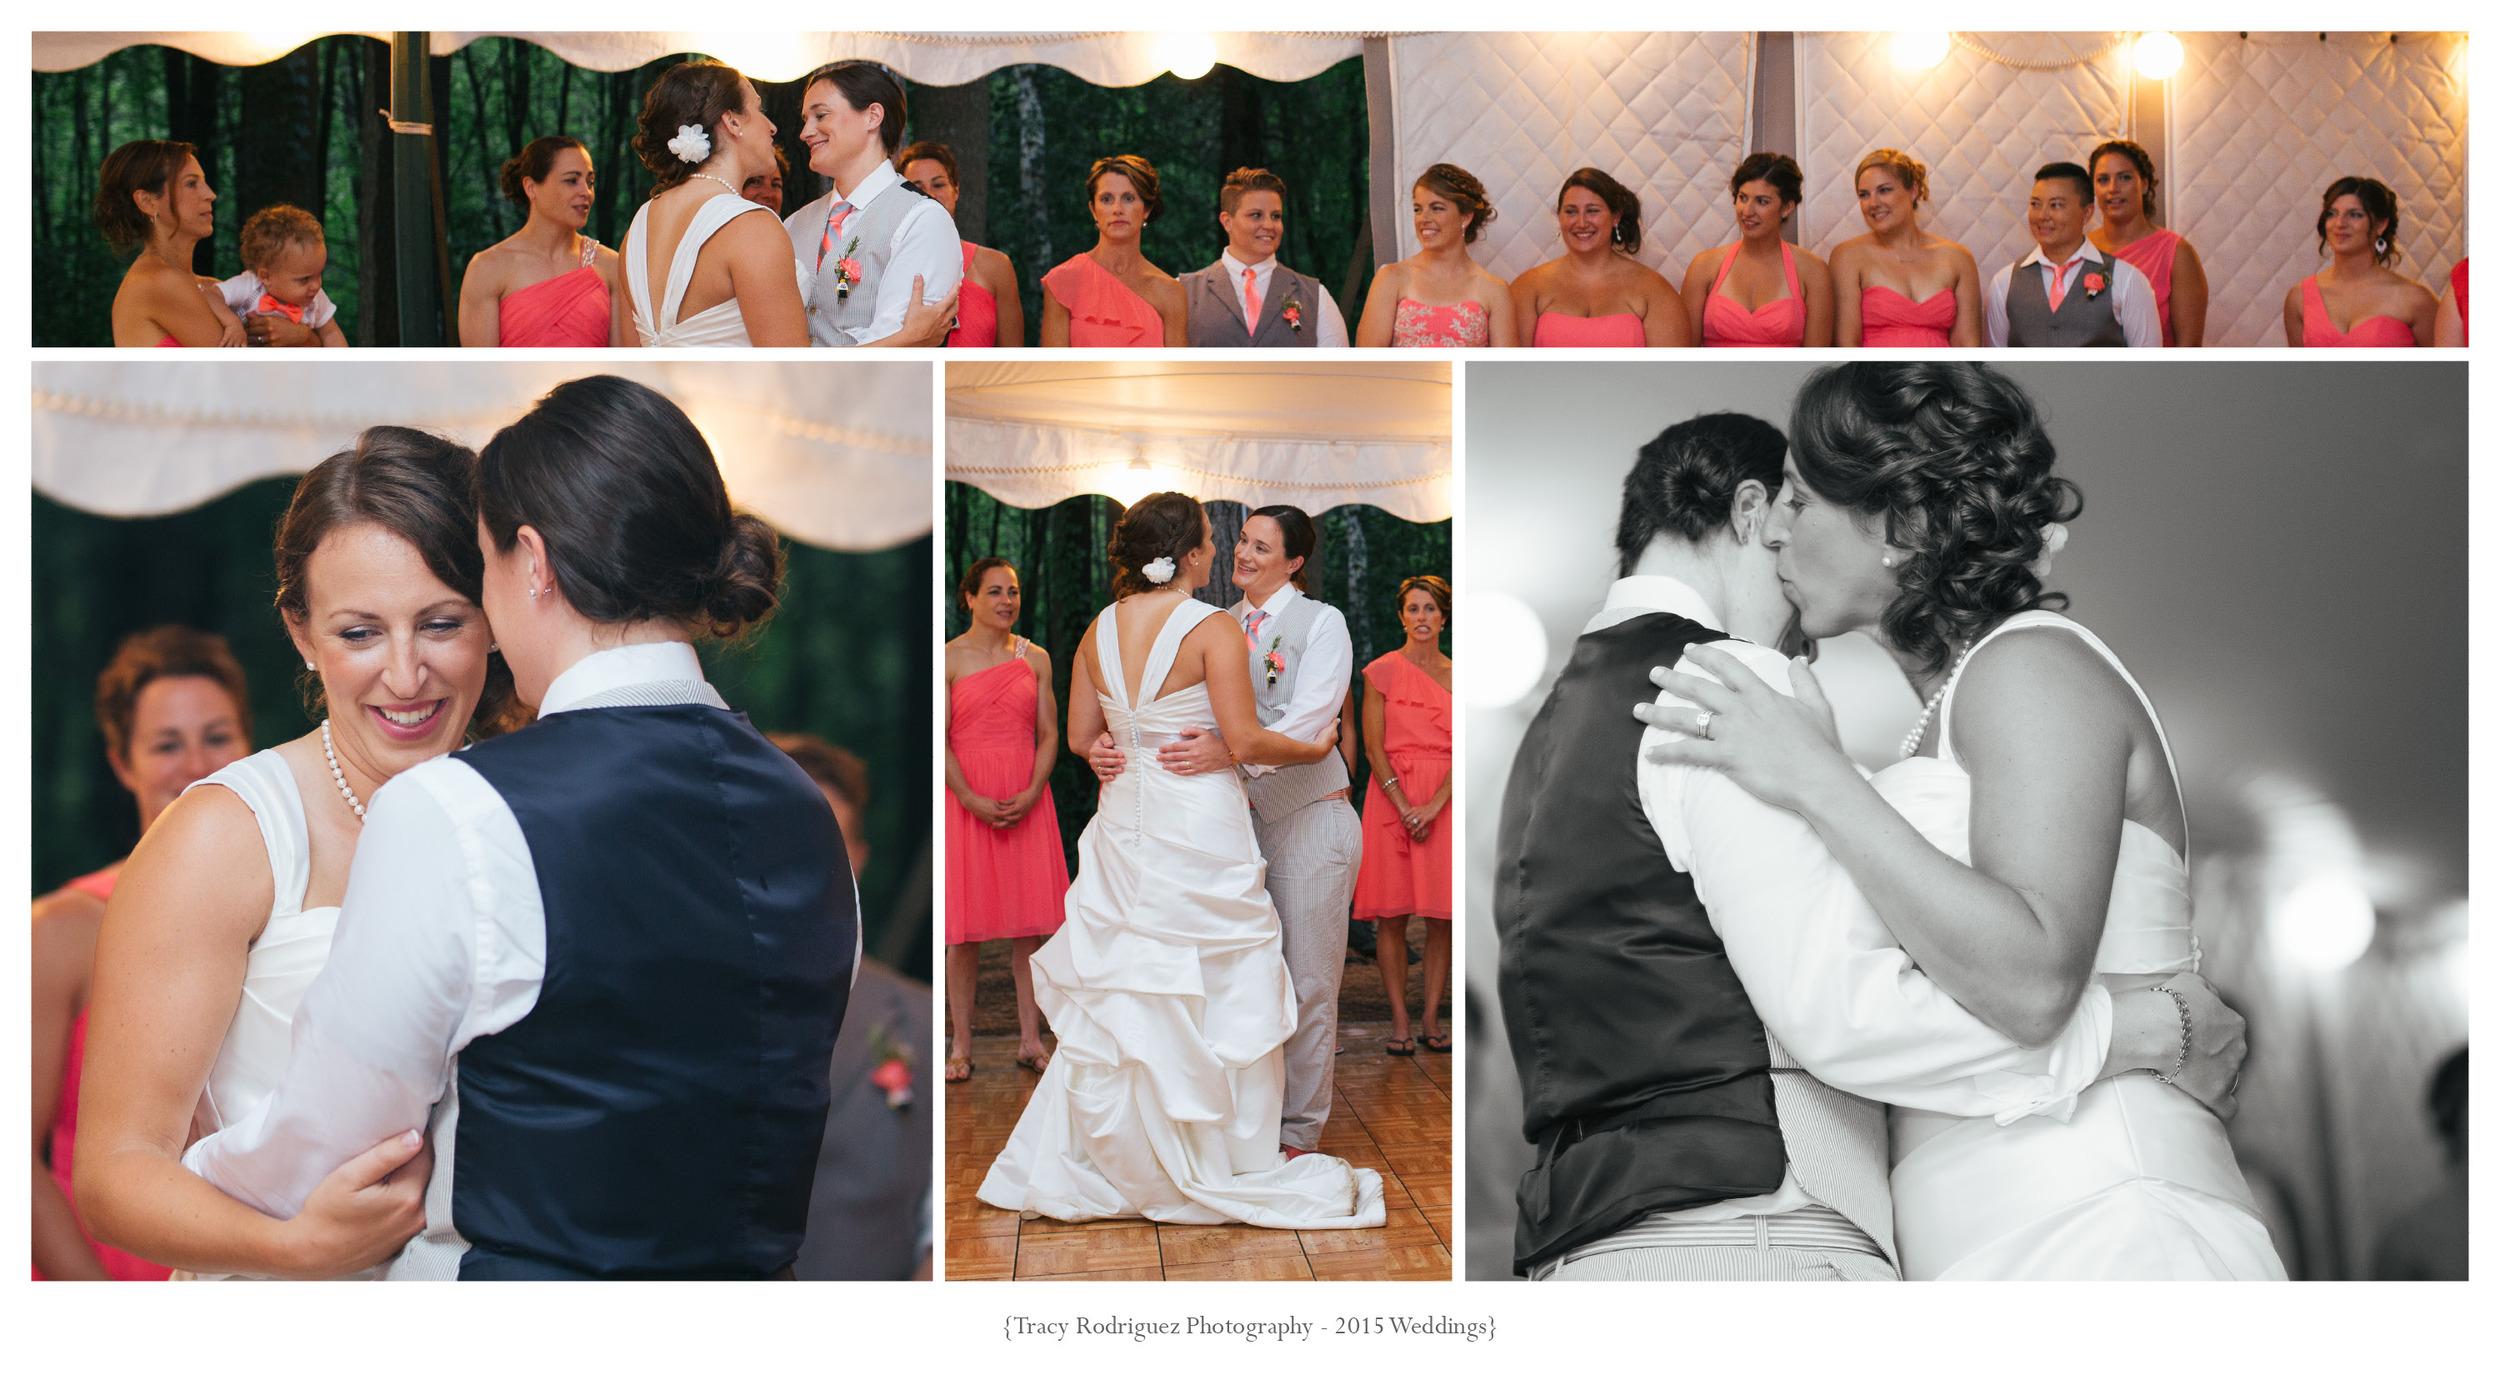 Slackberg Mock Wedding Album20.jpg